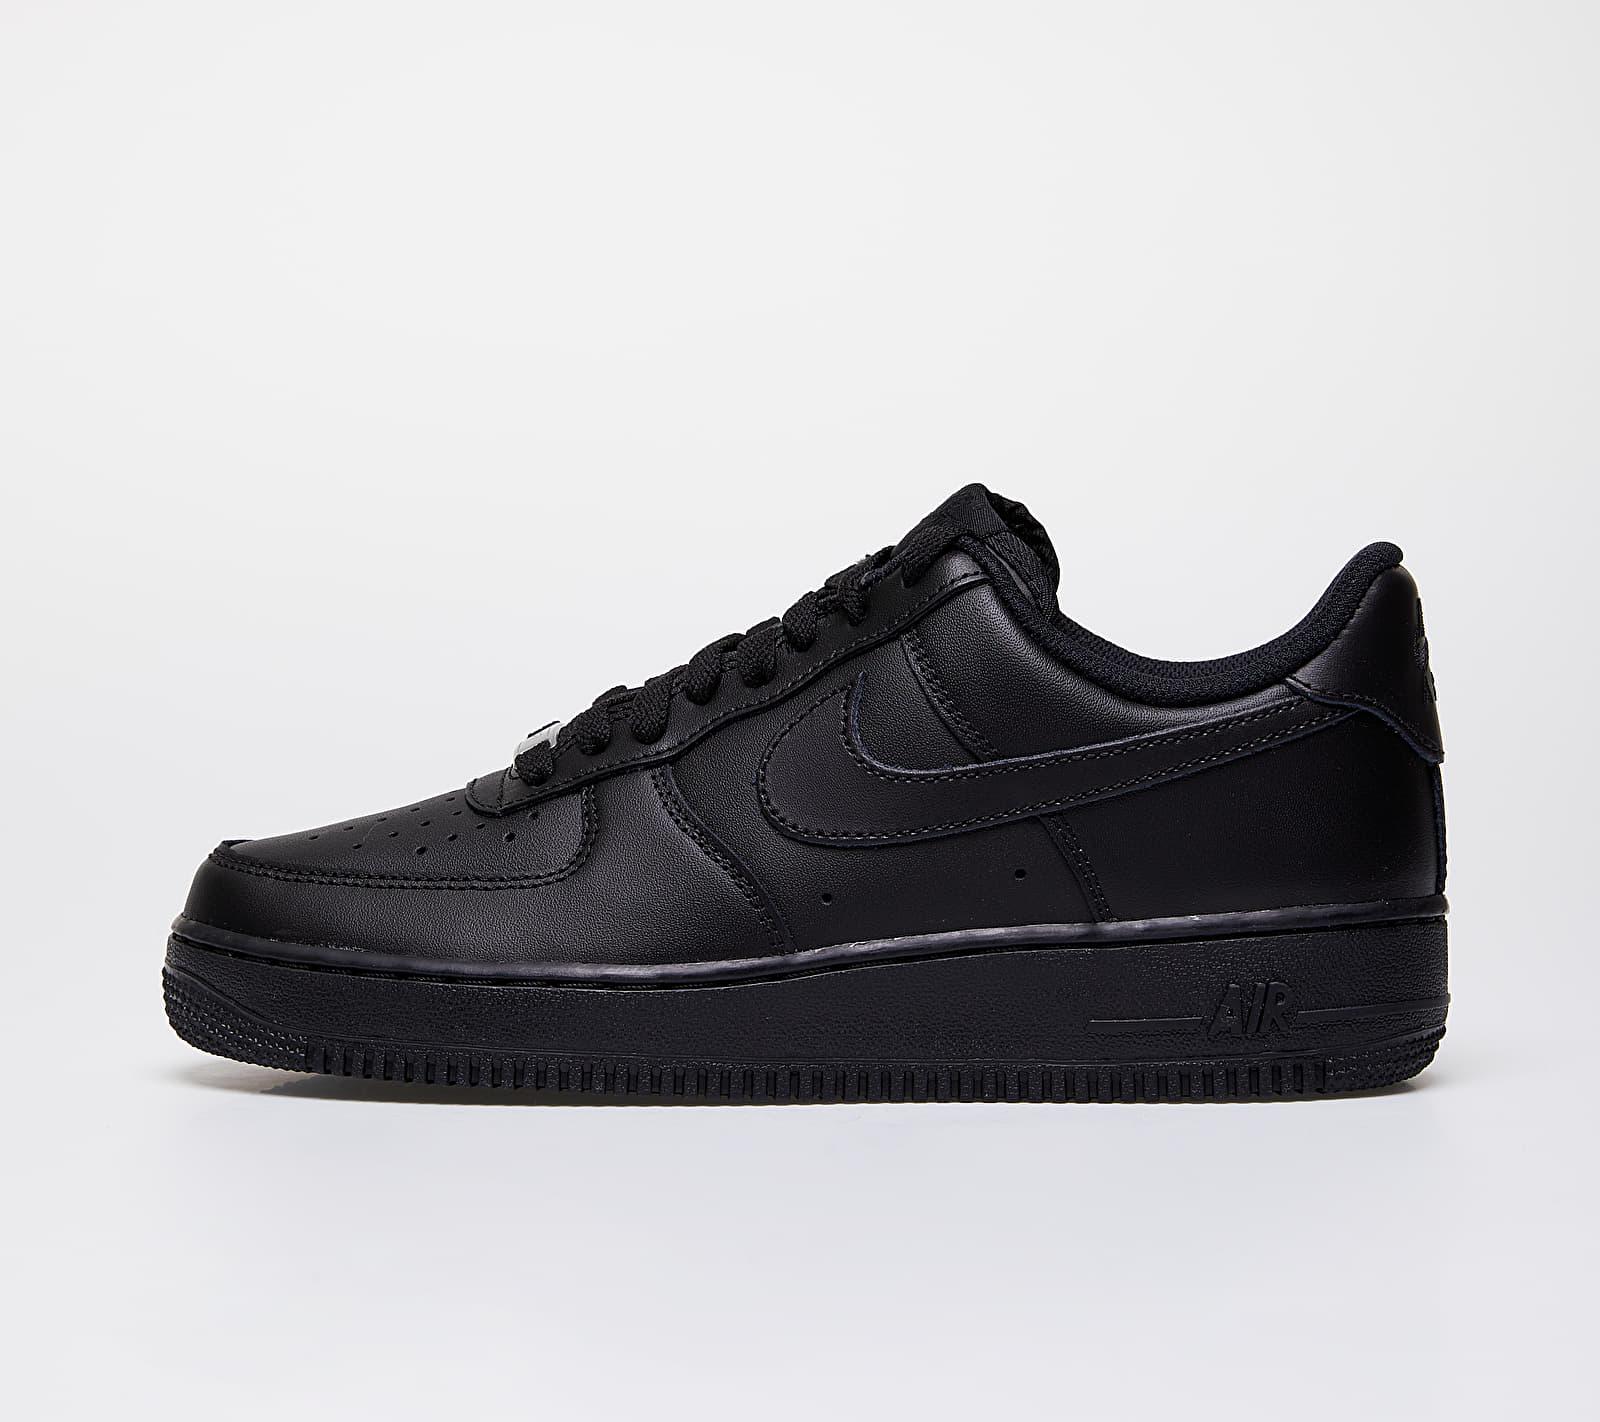 Nike Air Force 1 '07 Black/ Black 315122-001